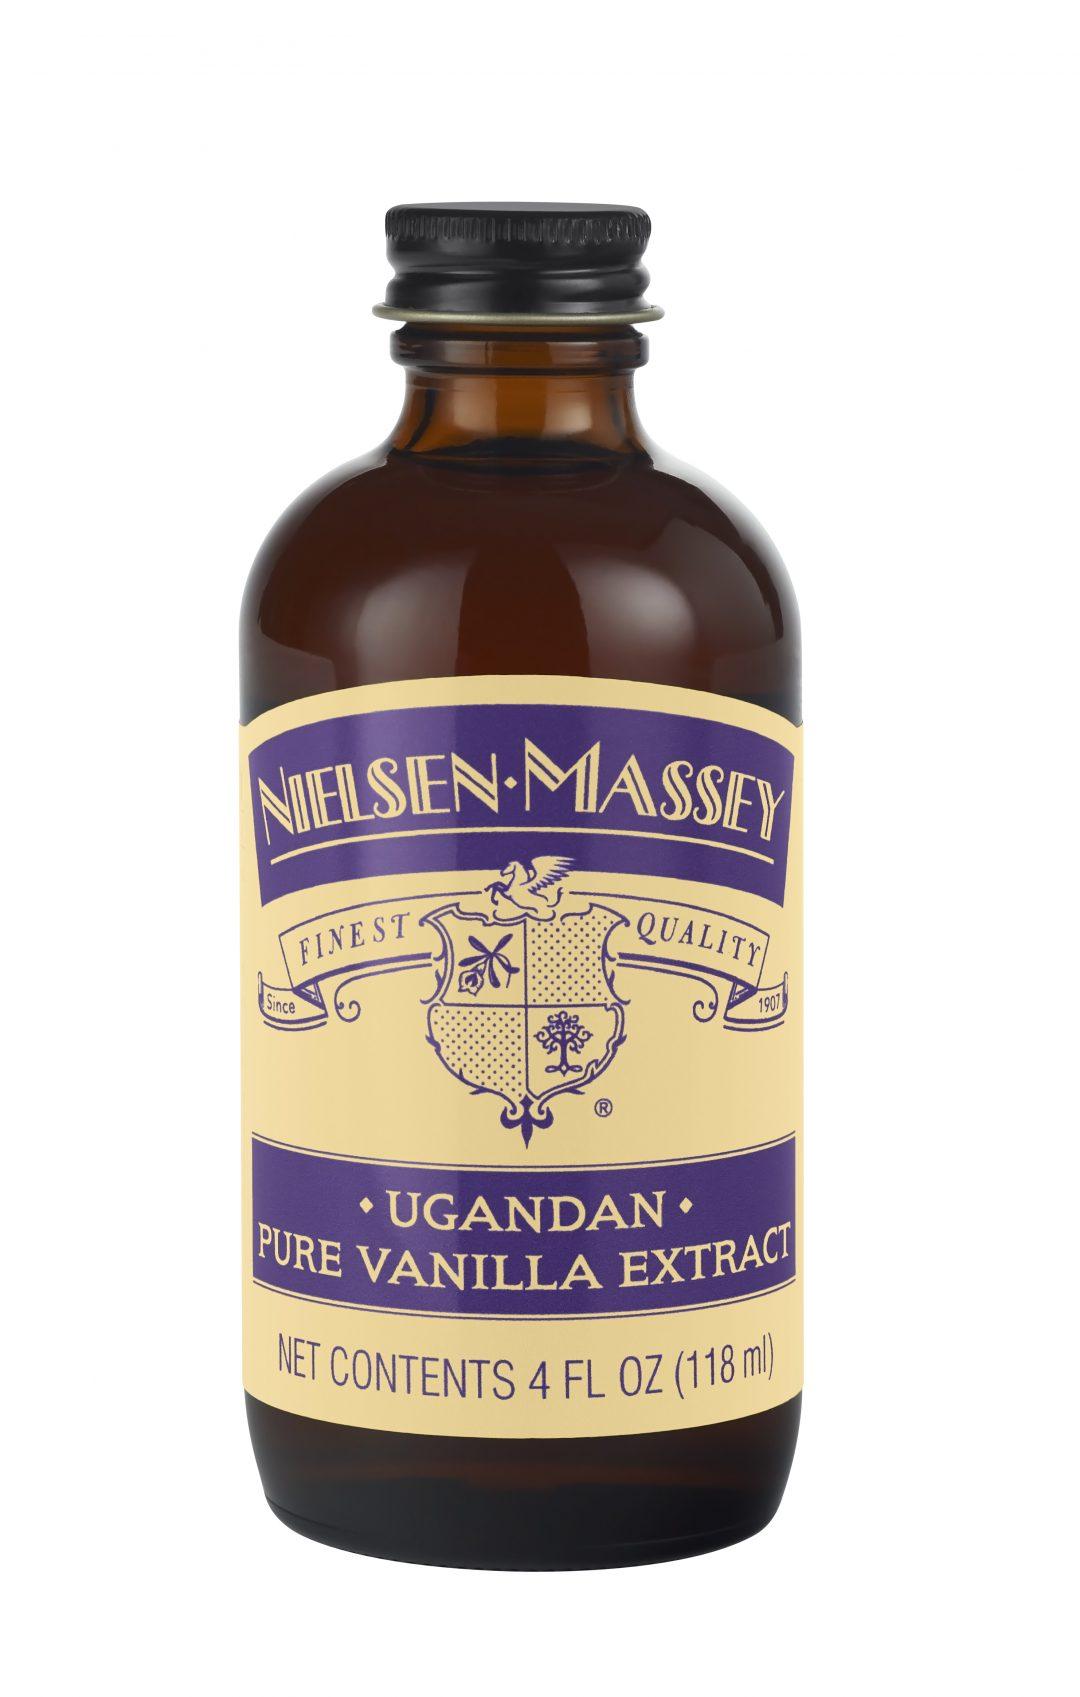 Ugandan Pure Vanilla Extract